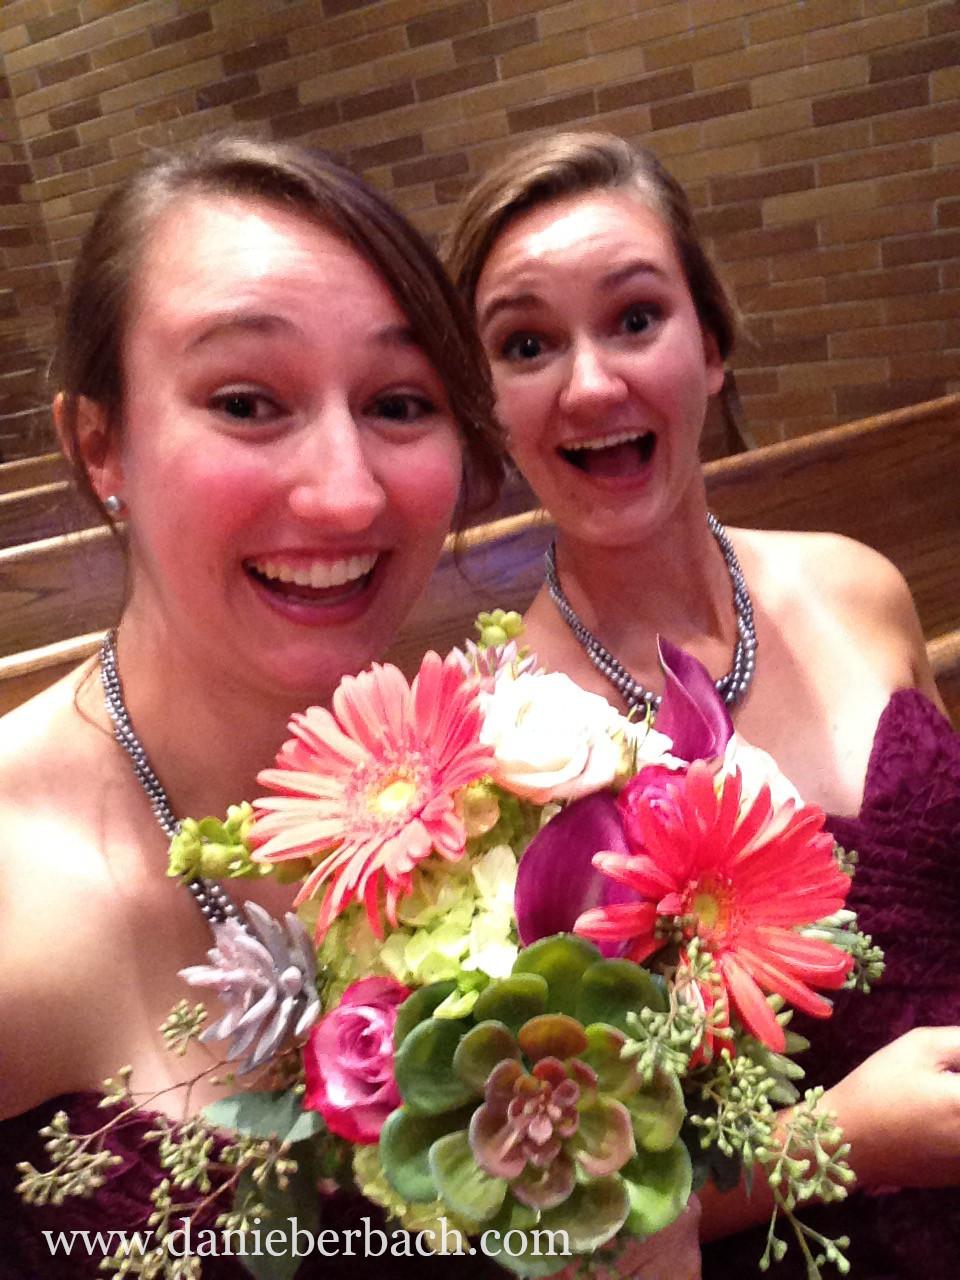 Bridesmaids selfie in church